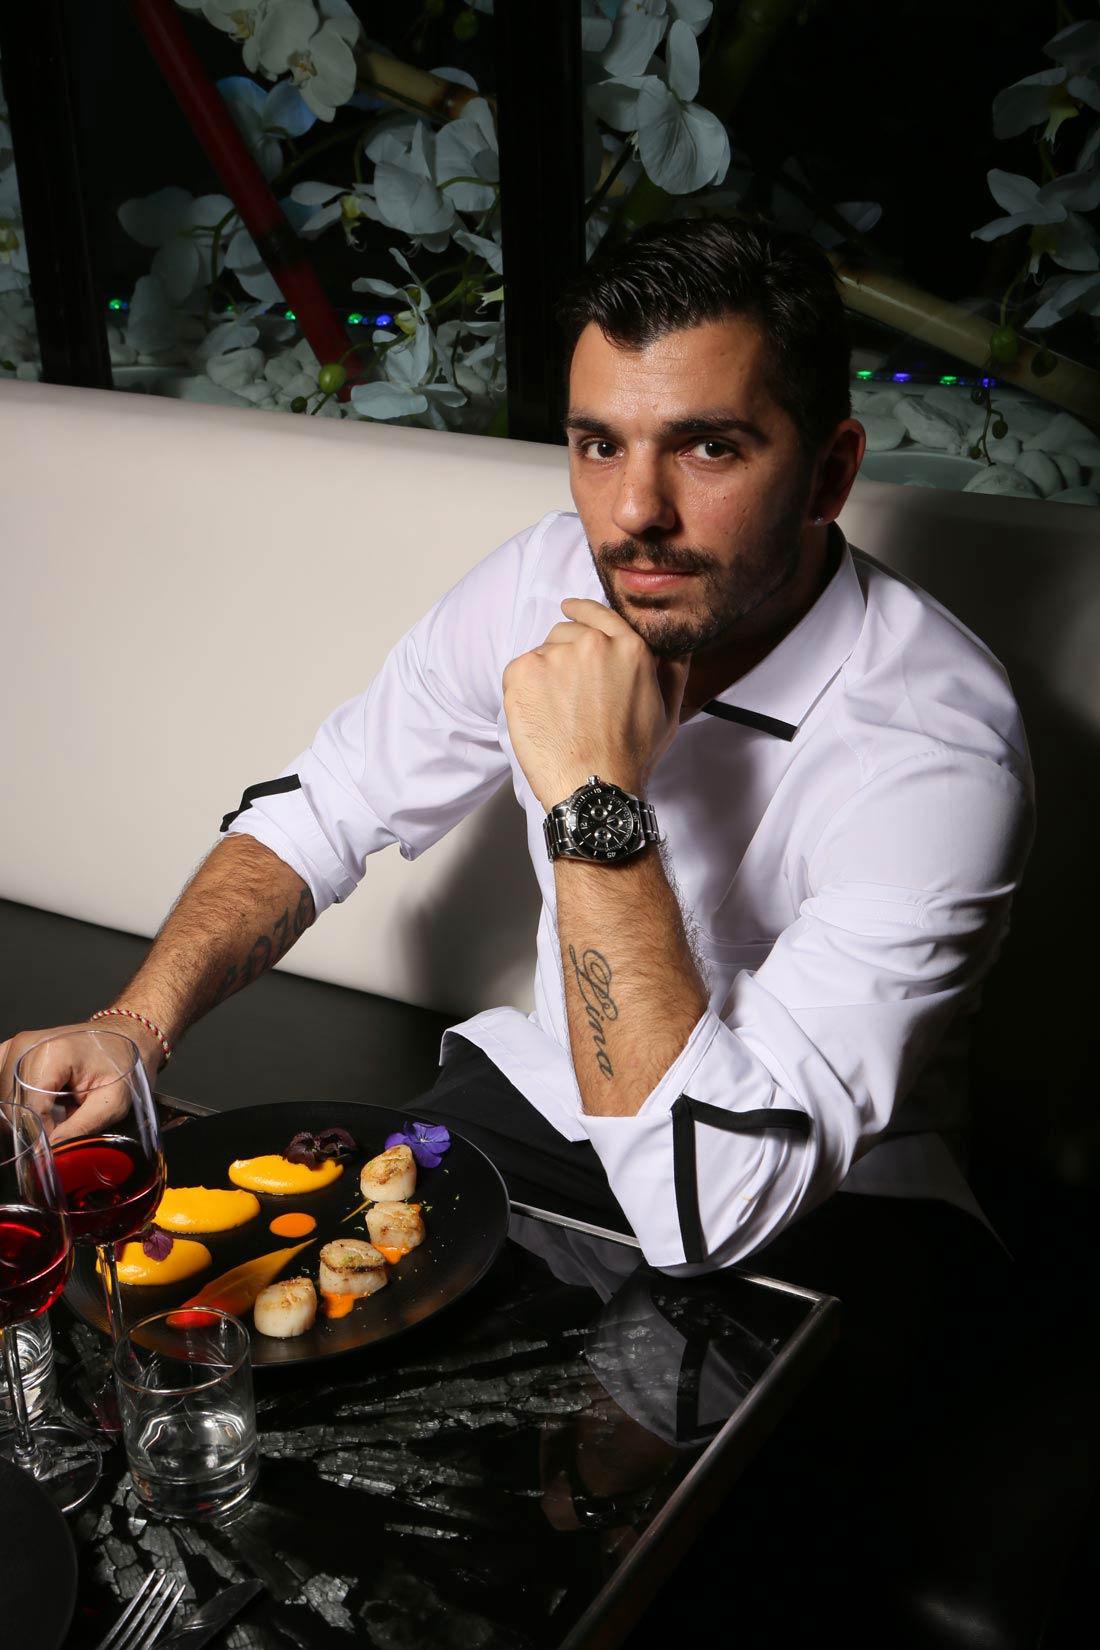 Hugo Pinto, Chef du restaurant Miam